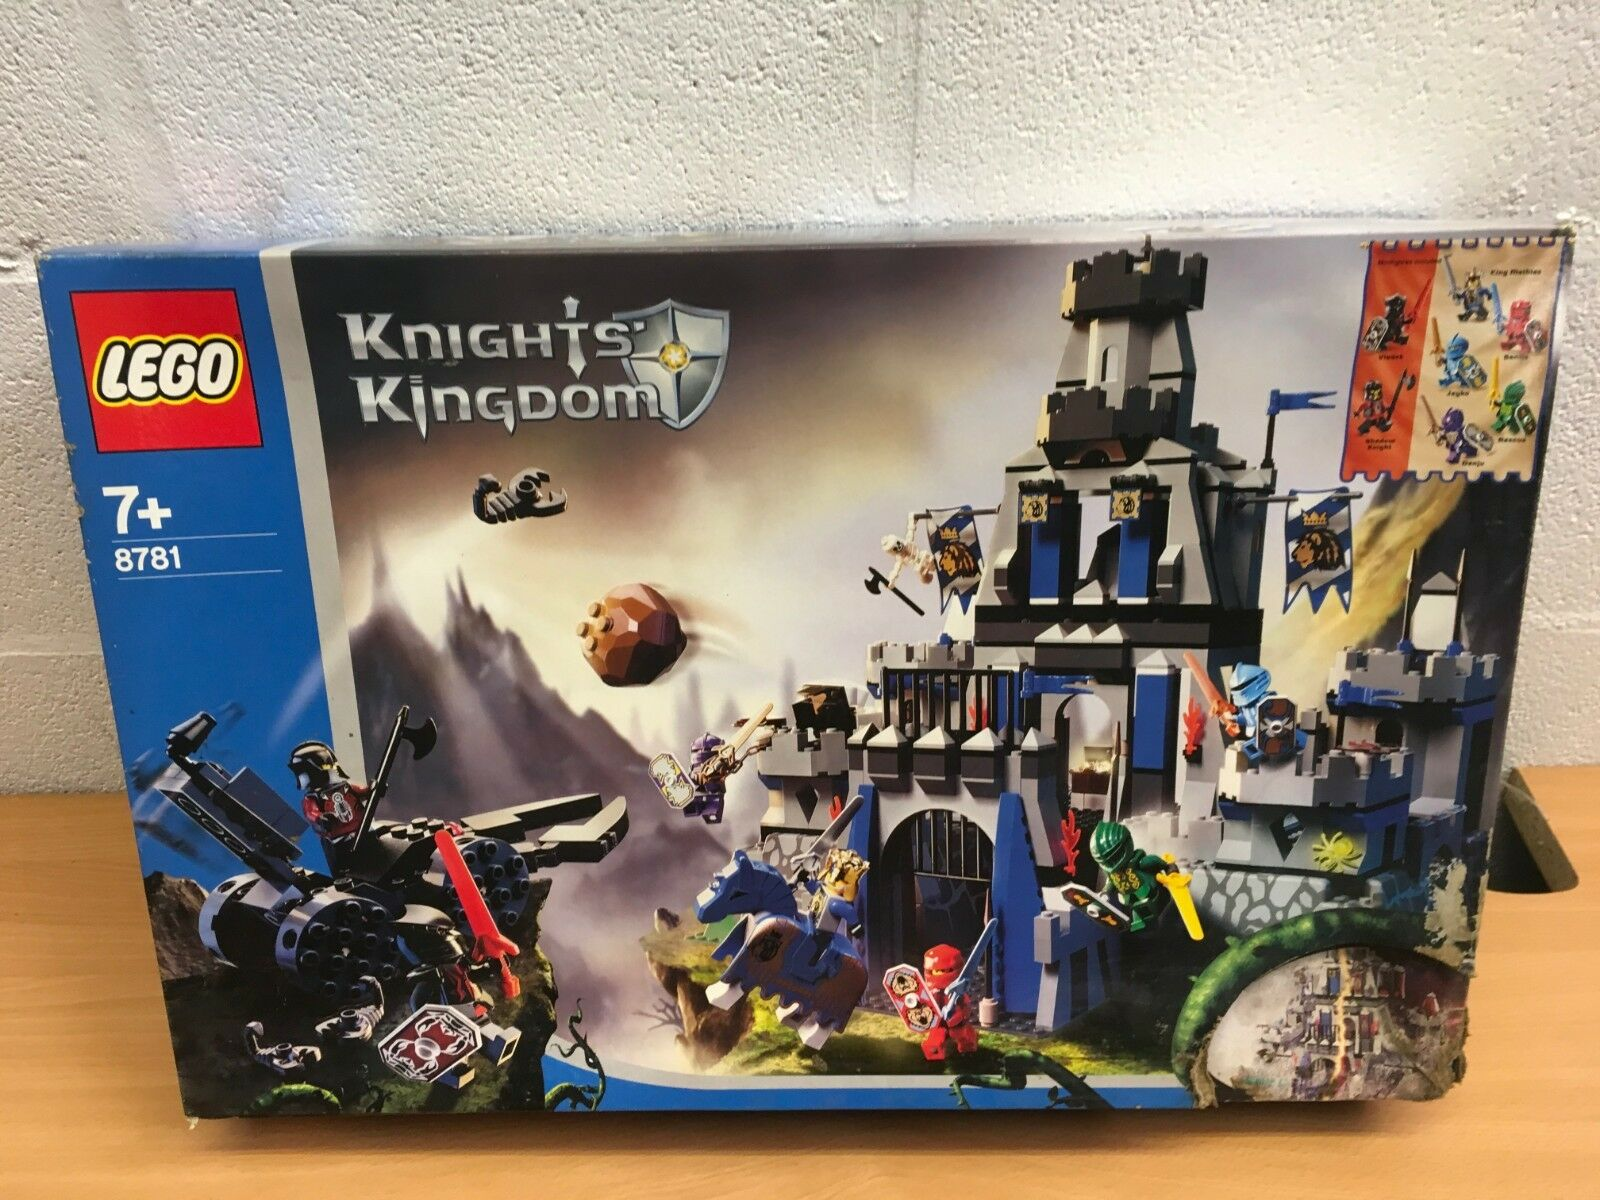 LEGO KNIGHTS' KINGDOM 8781 CASTLE OF MORCIA NEW SEALED